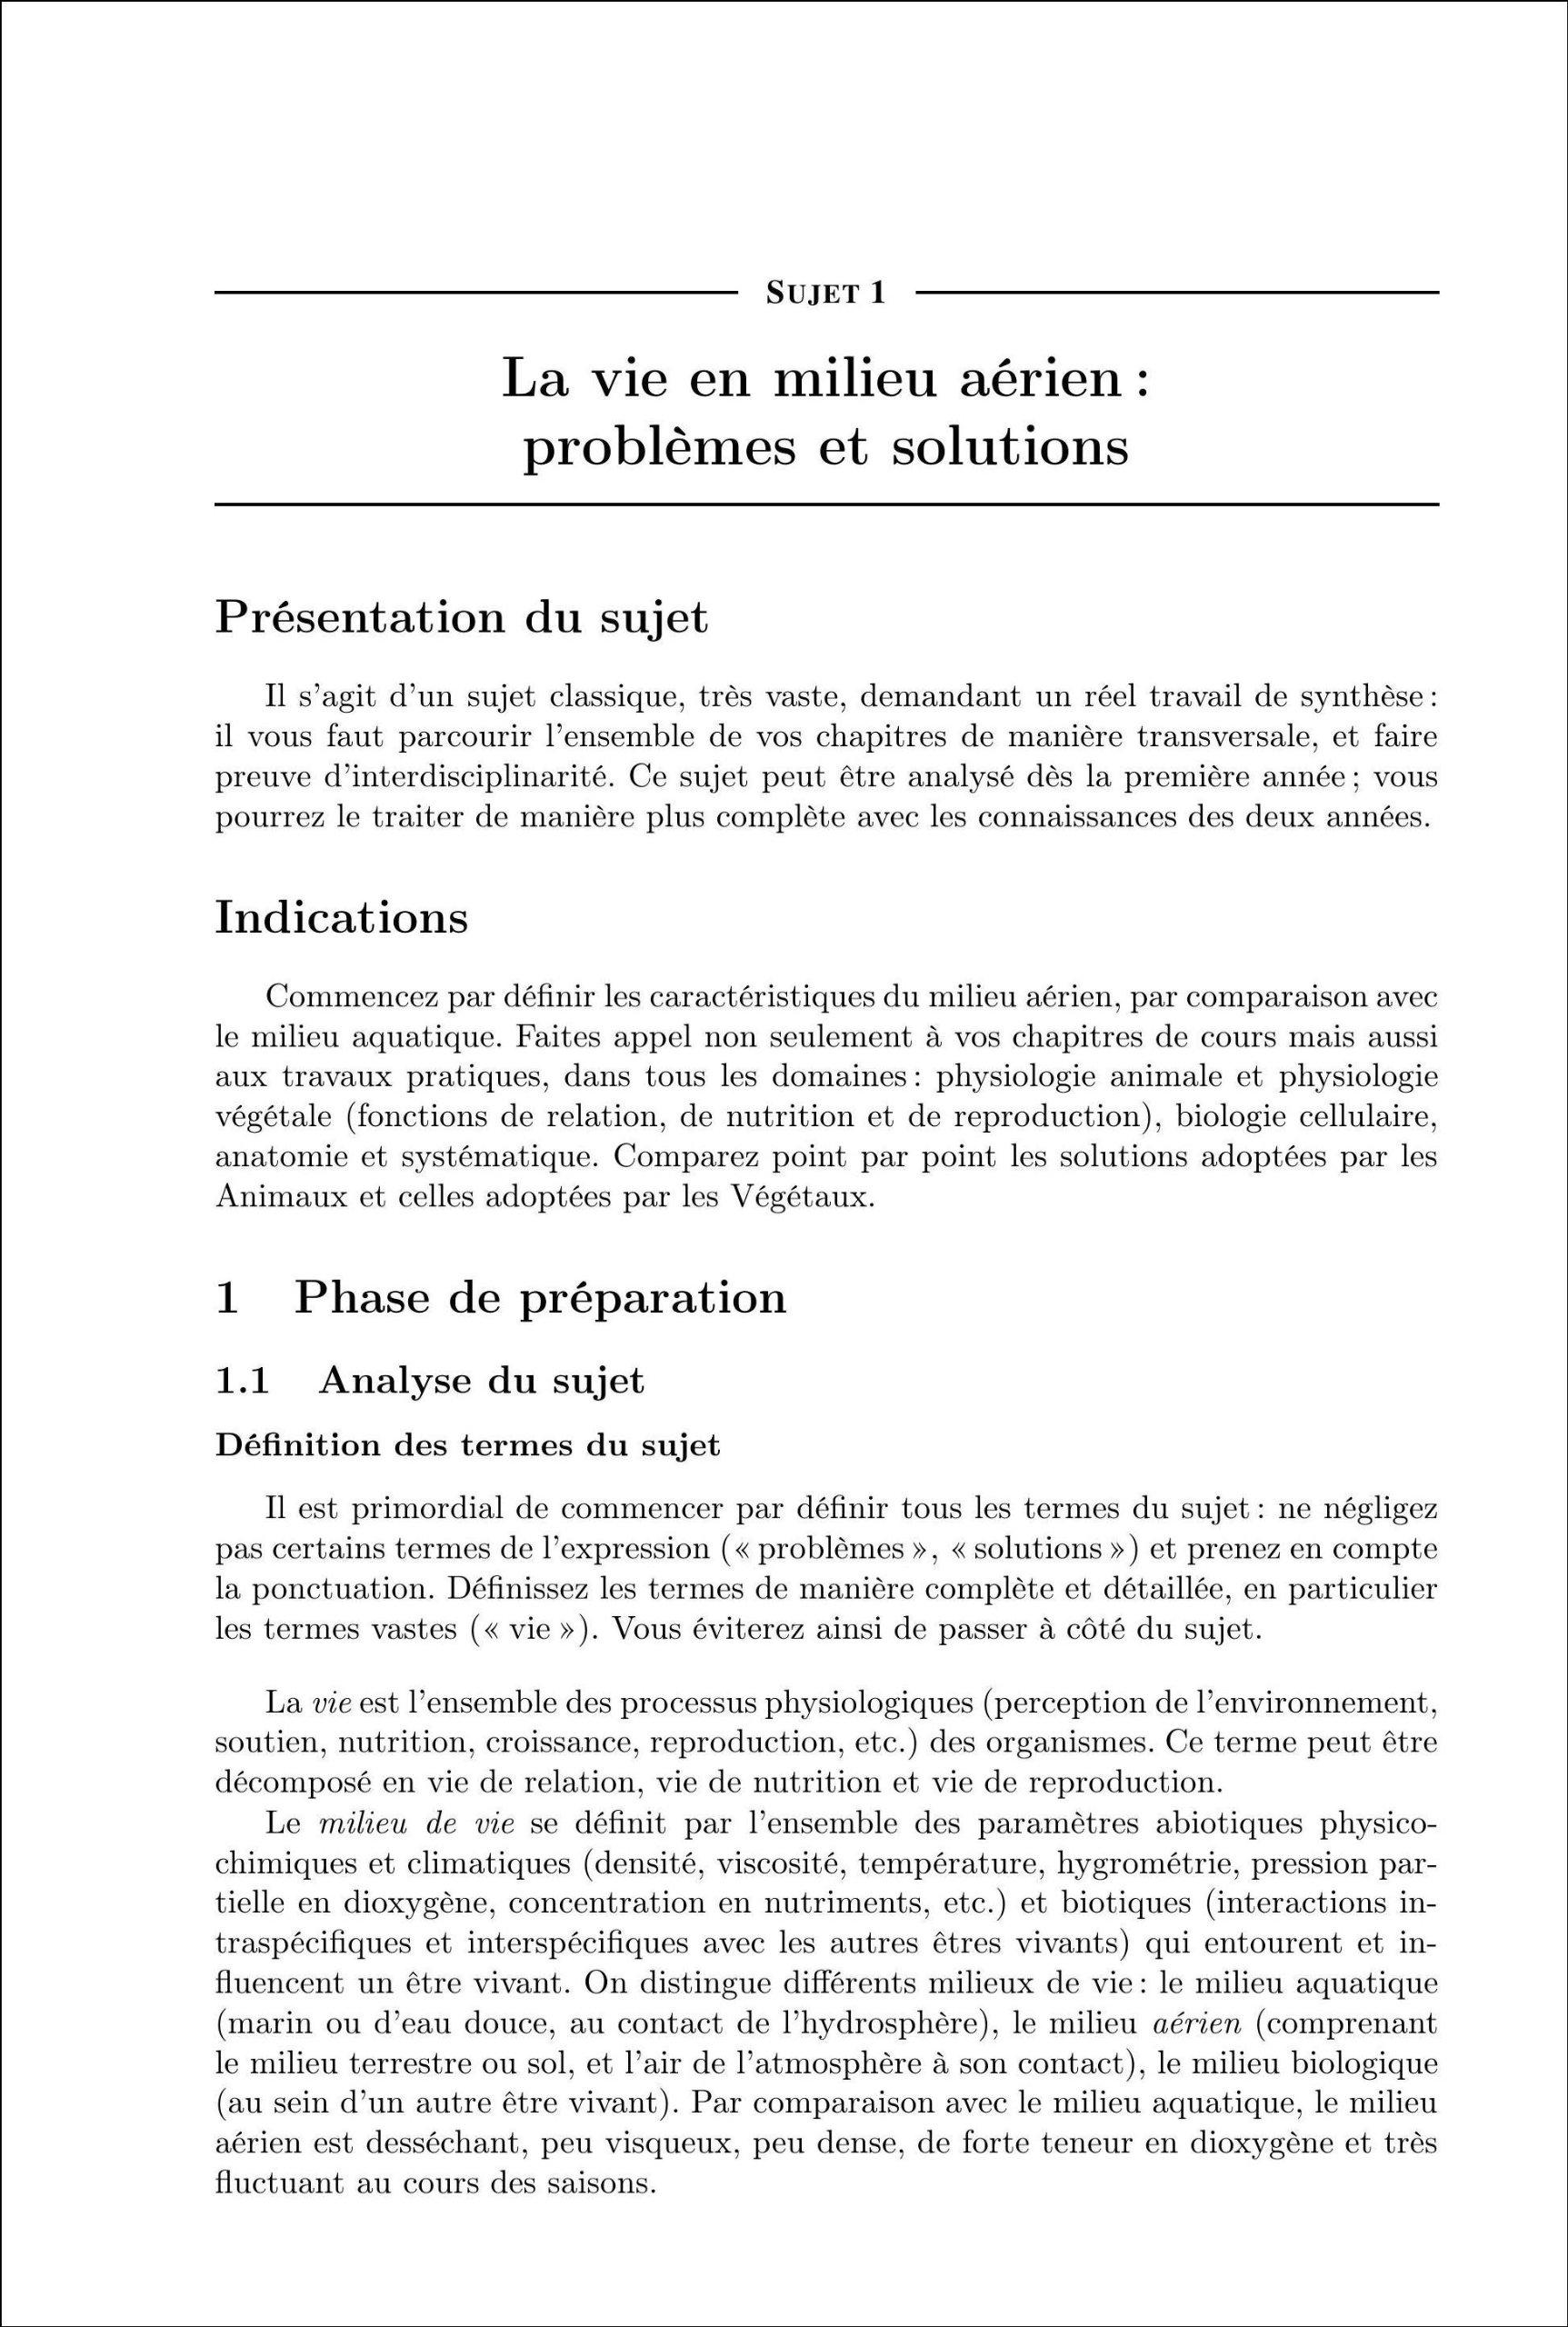 Le sujet de synthèse par lexemple: Amazon.es: Alexandra Goudard: Libros en idiomas extranjeros